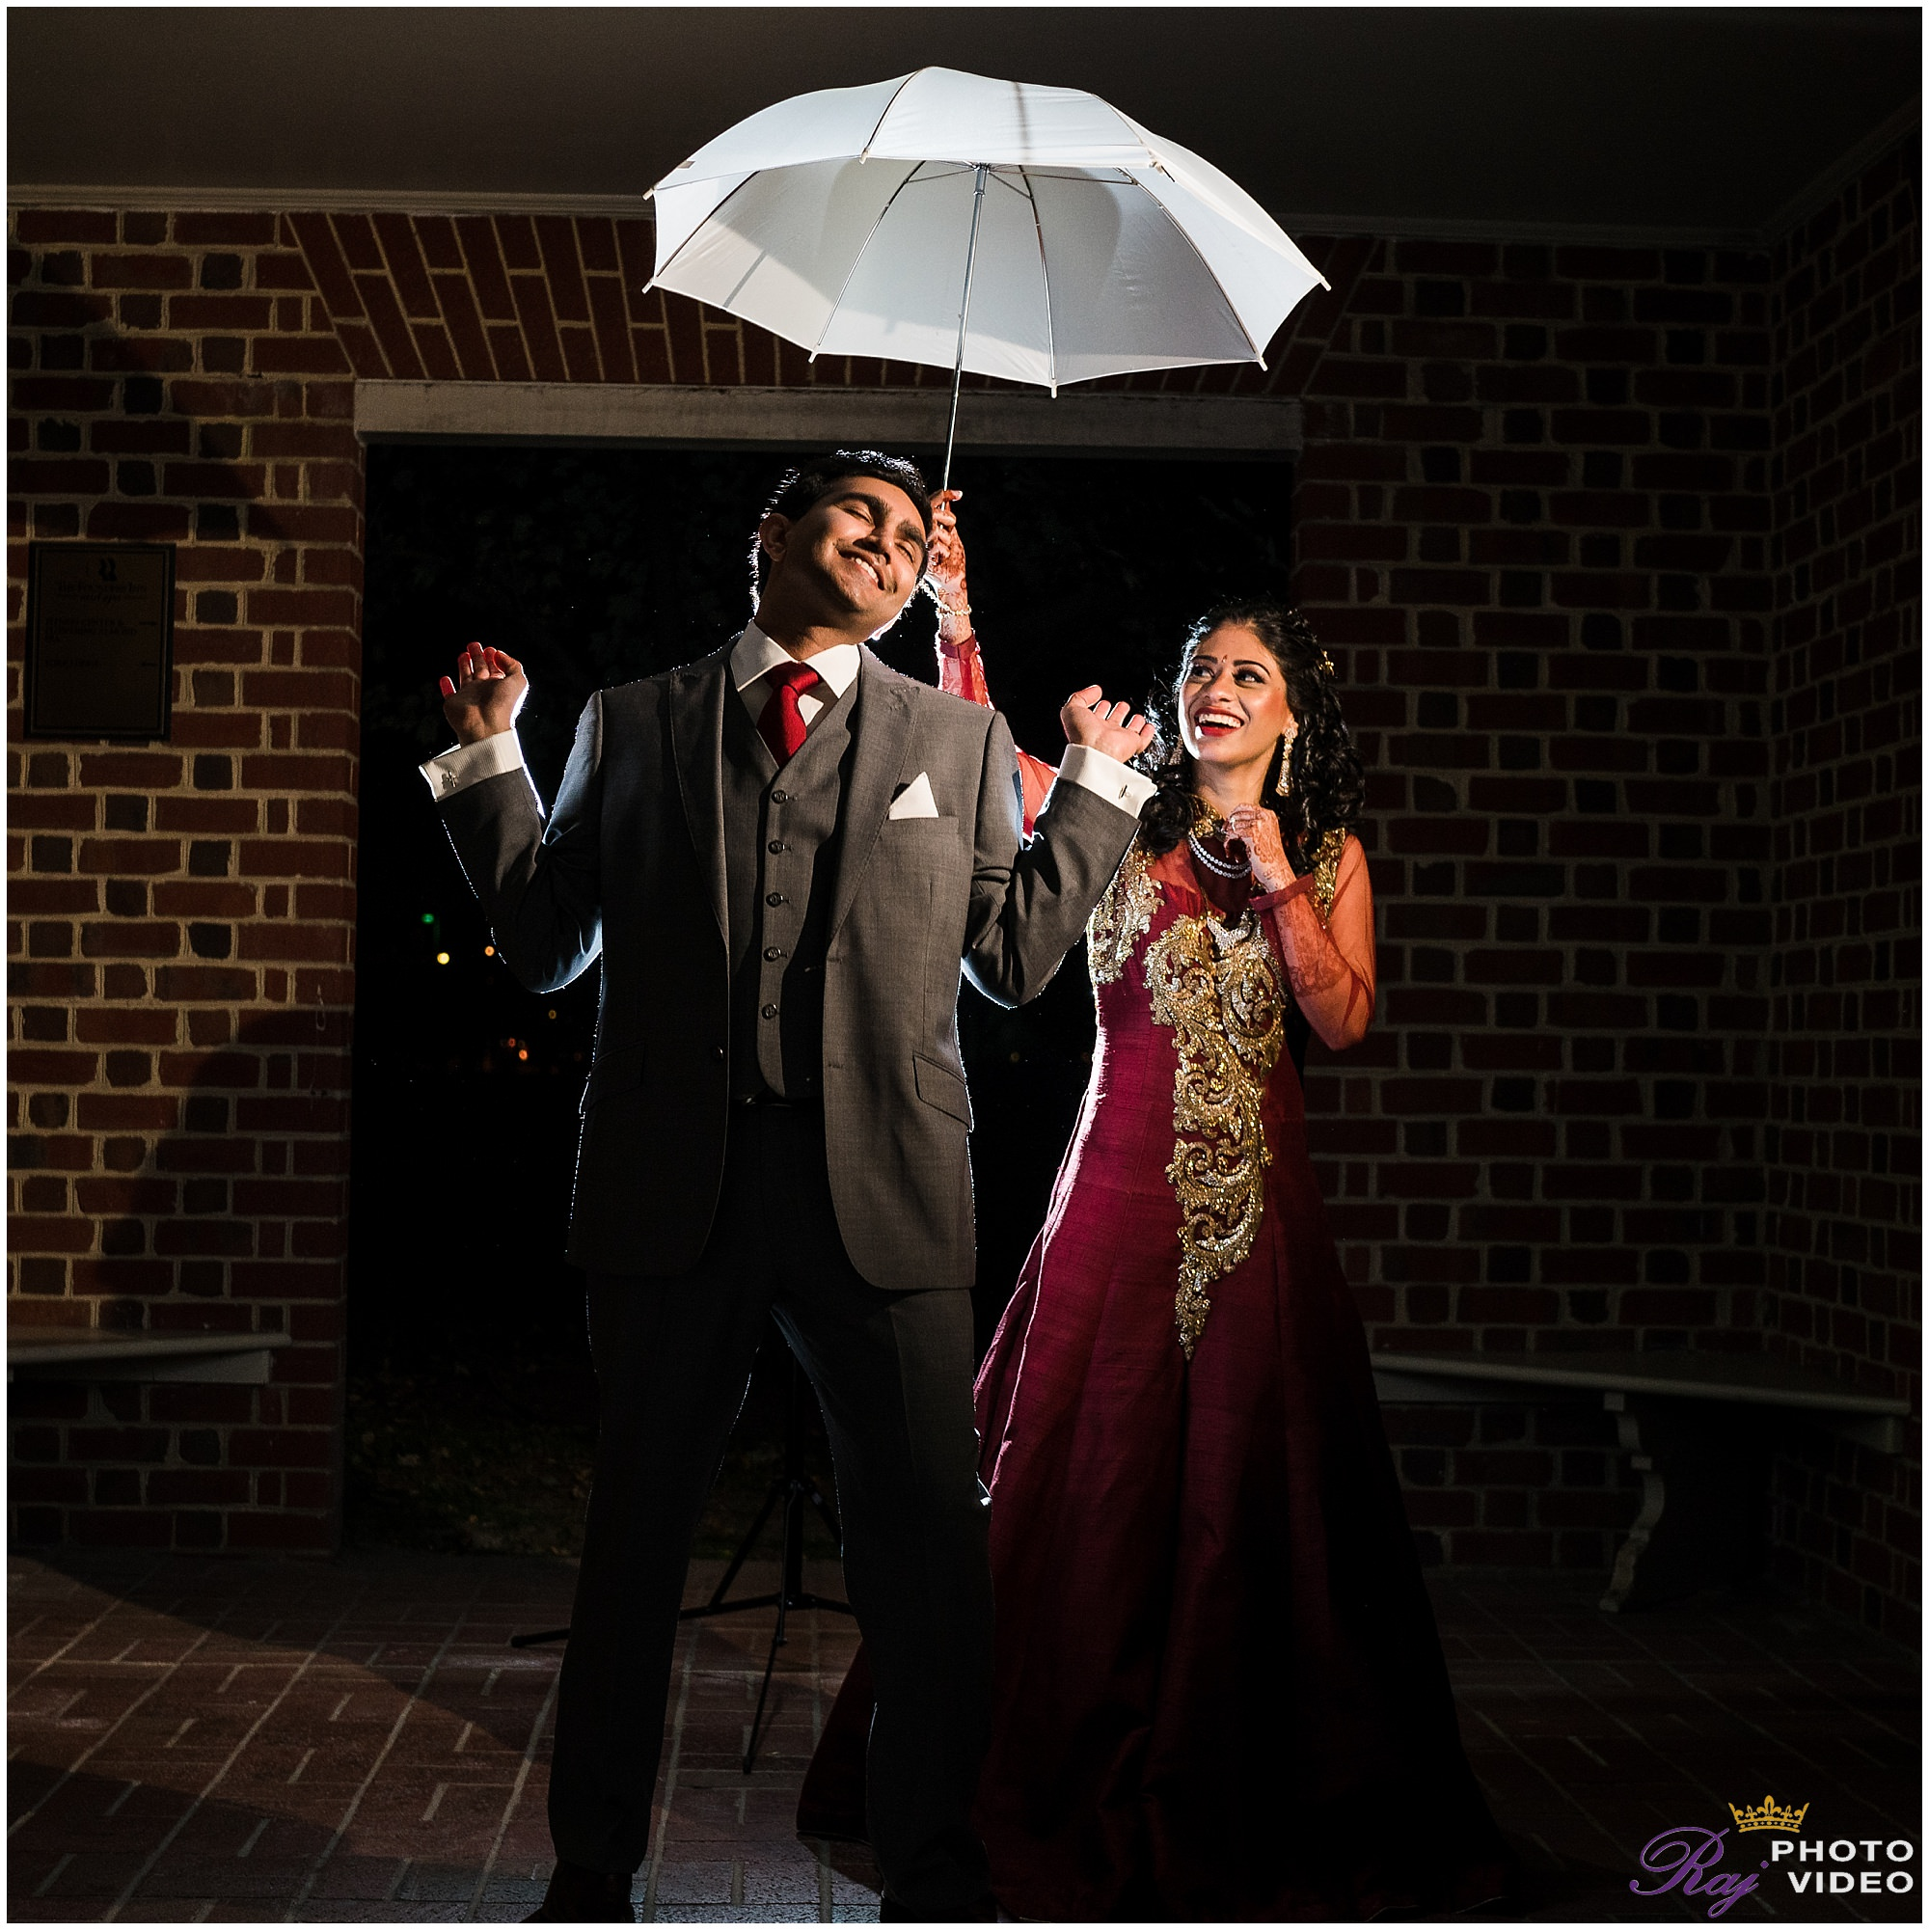 Founders-Inn-and-Spa-Virginia-Beach-VA-Indian-Wedding-Harini-Vivek-72.jpg